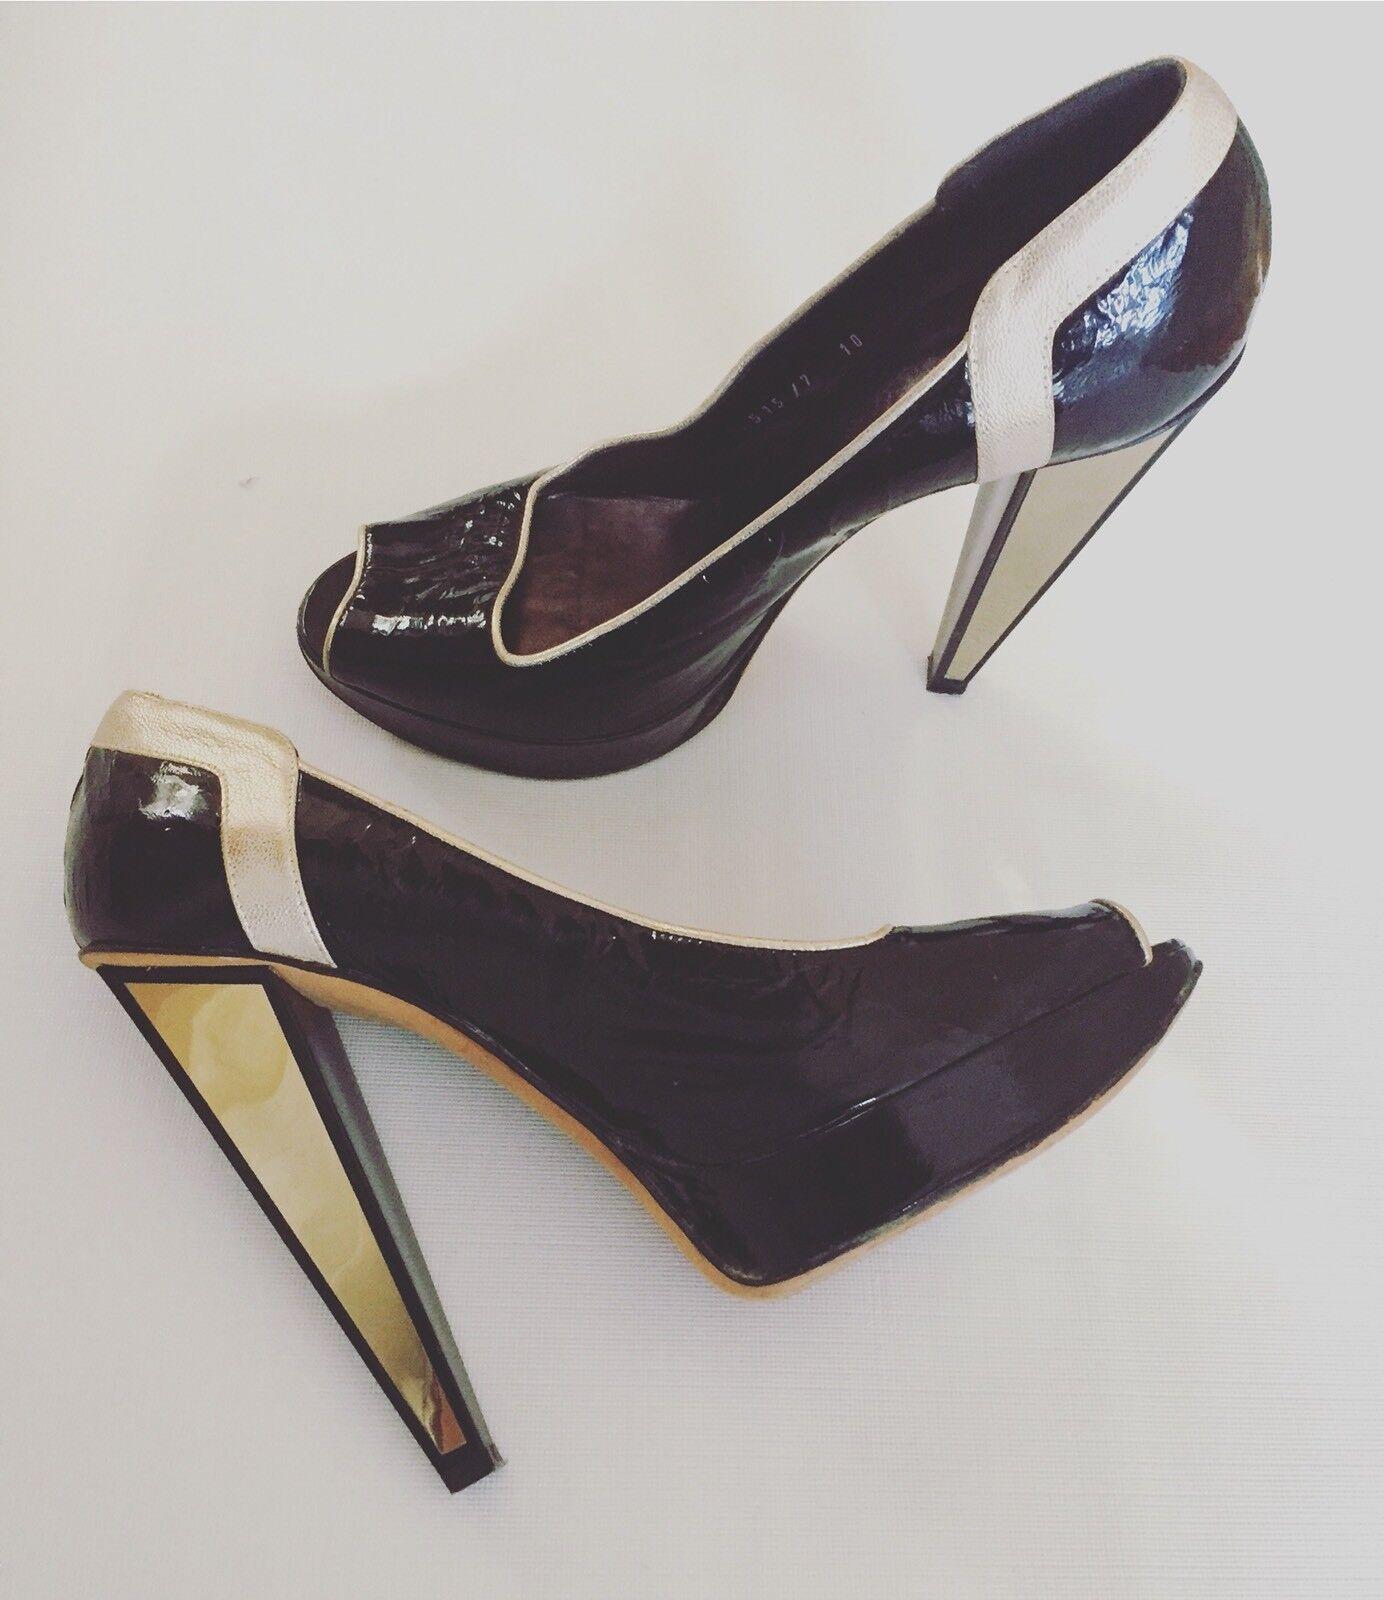 savingglory VERSACE Platforms Patent Leather High Heels Stilettos 40 Au 10